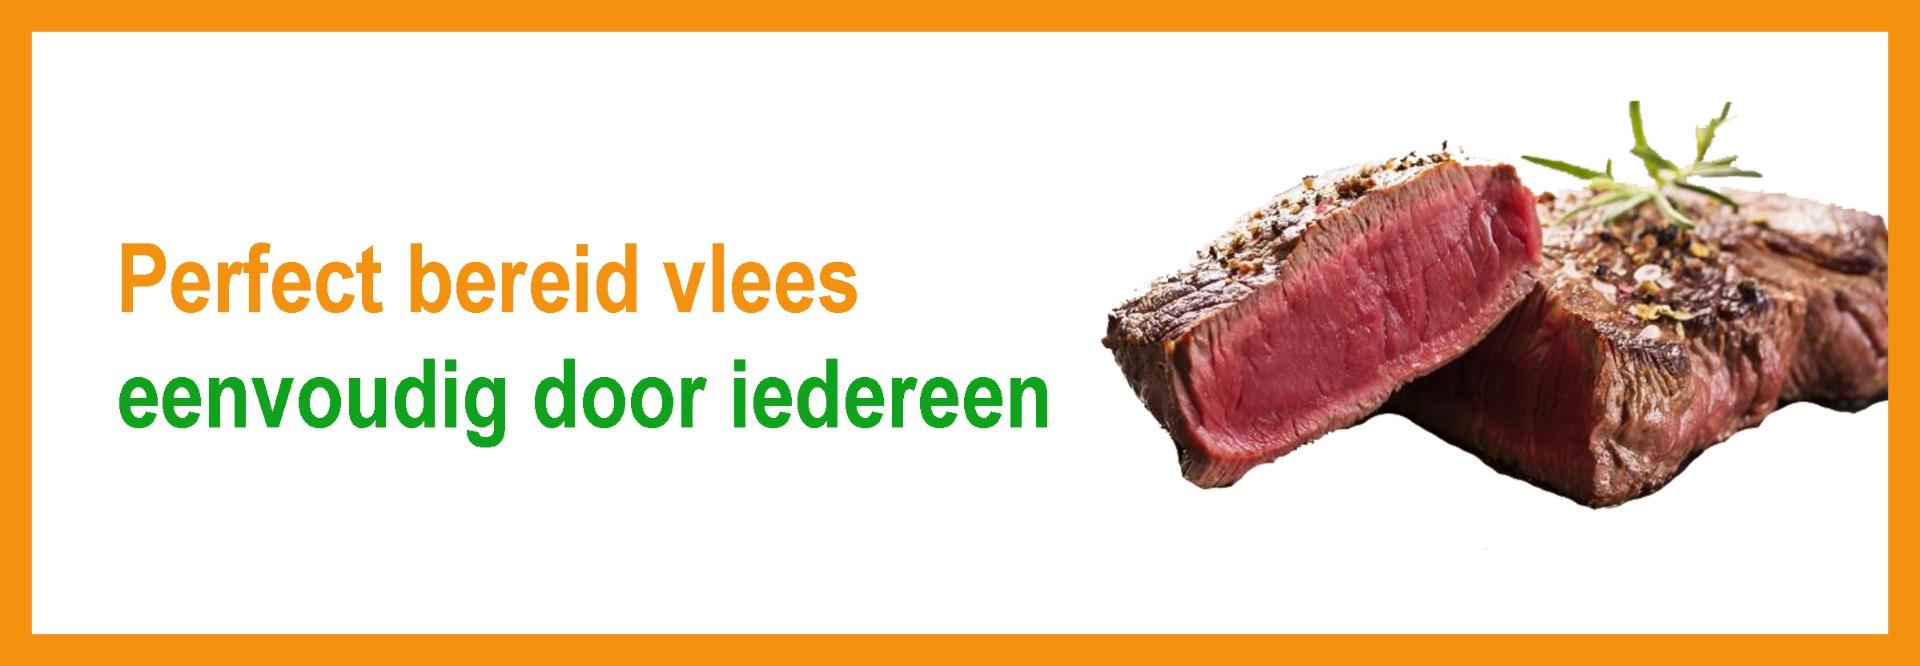 Pellet bbq - perfect vlees